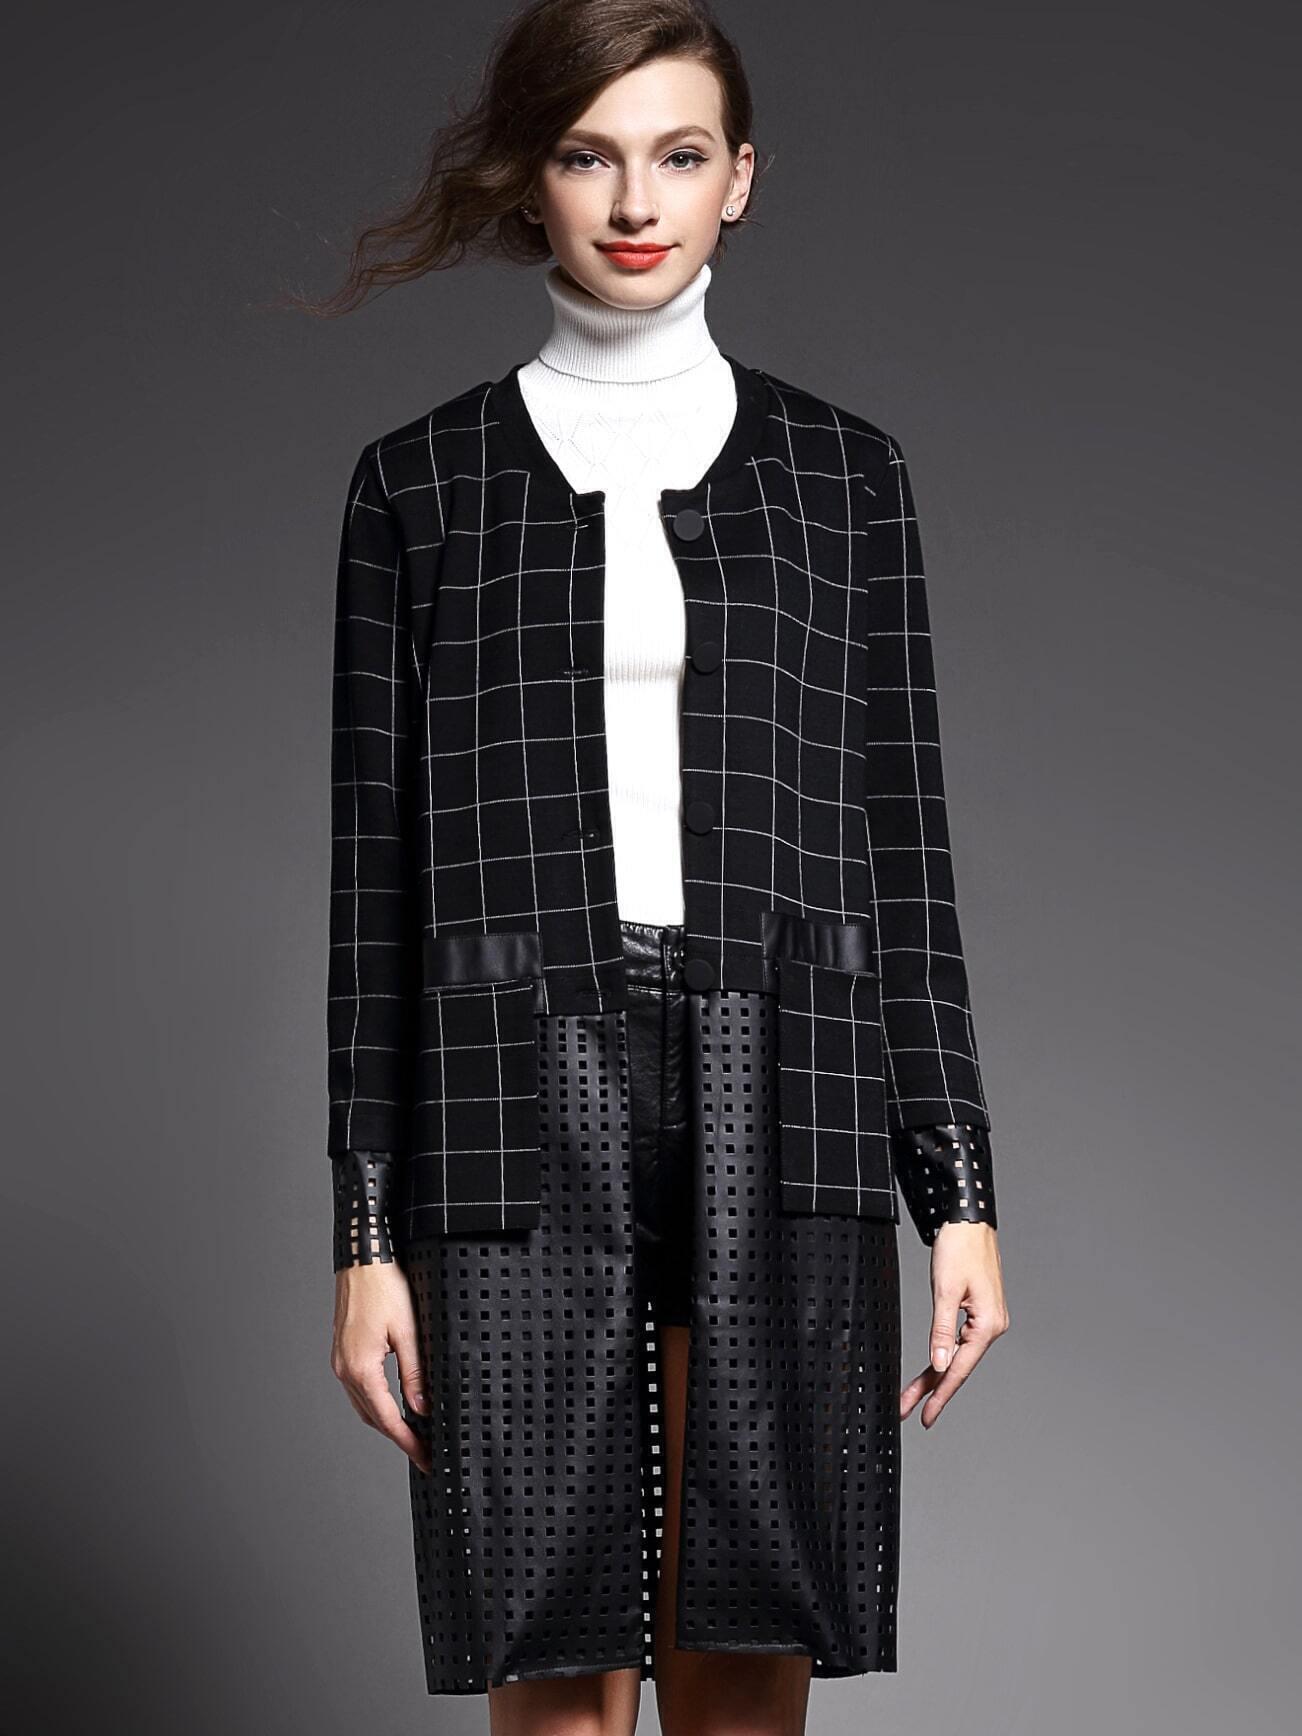 Black Round Neck Long Sleeve Contrast Pu Pockets Coat